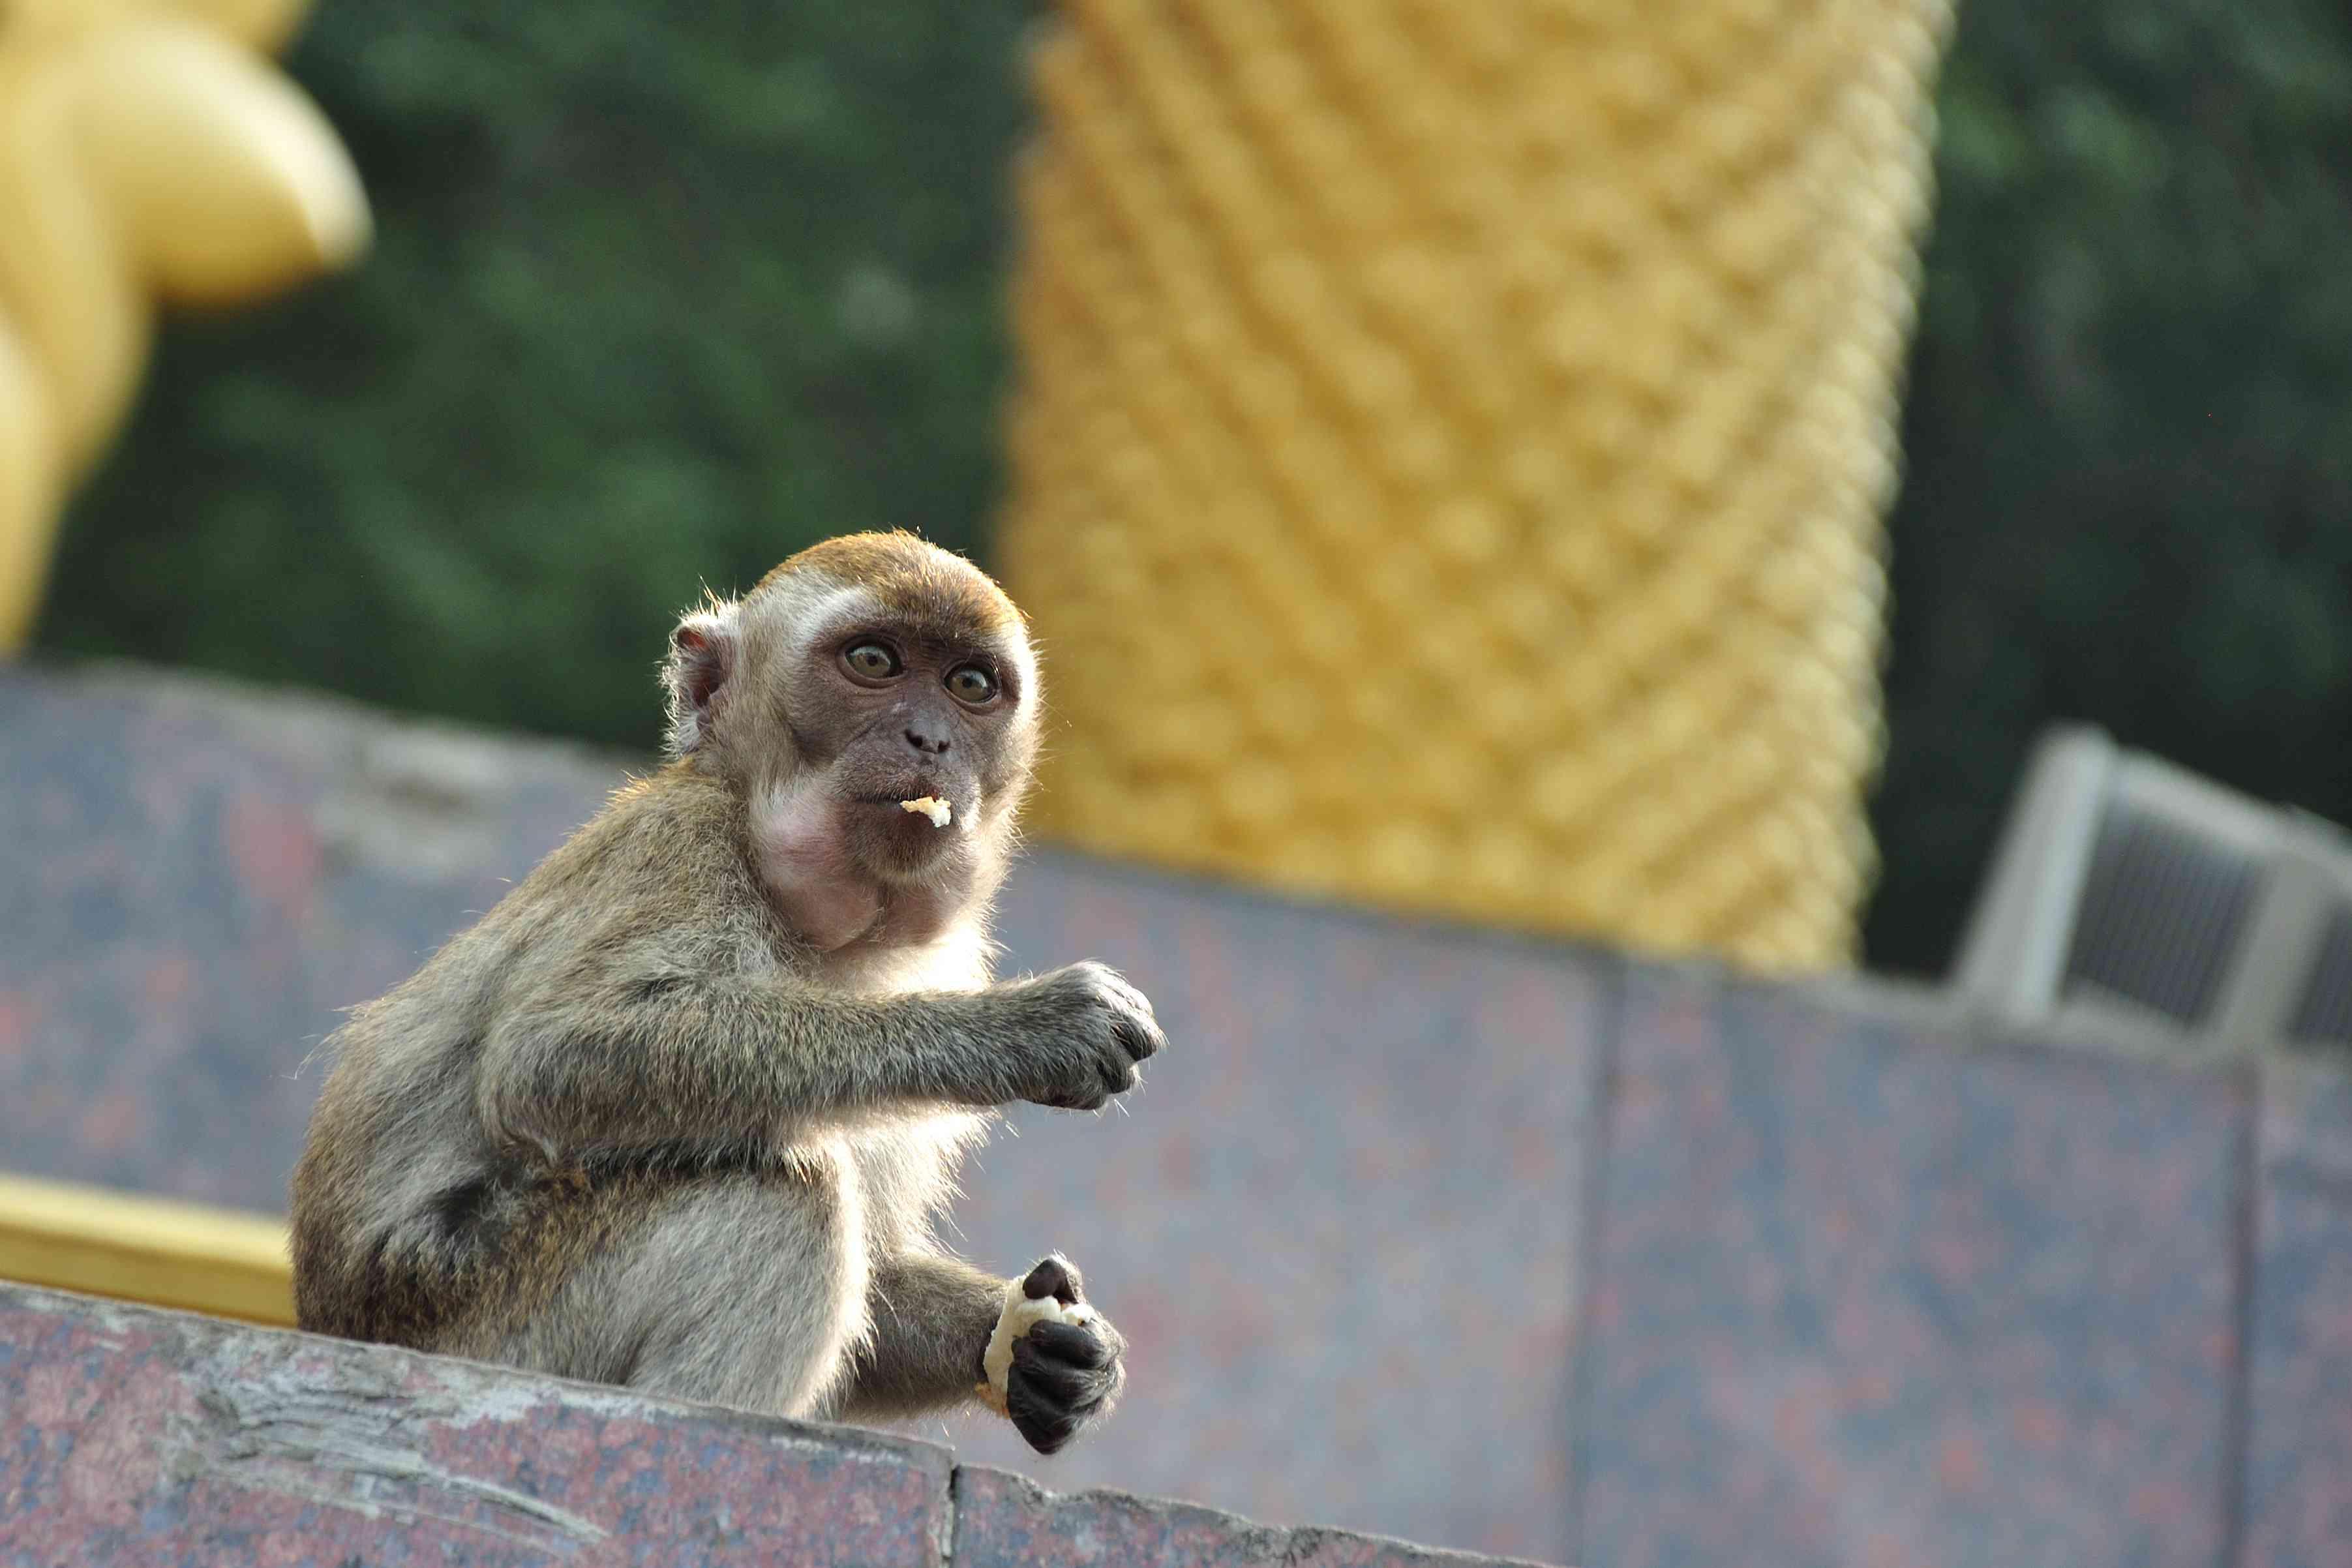 Macaque monkey at the Batu Caves in Kuala Lumpur